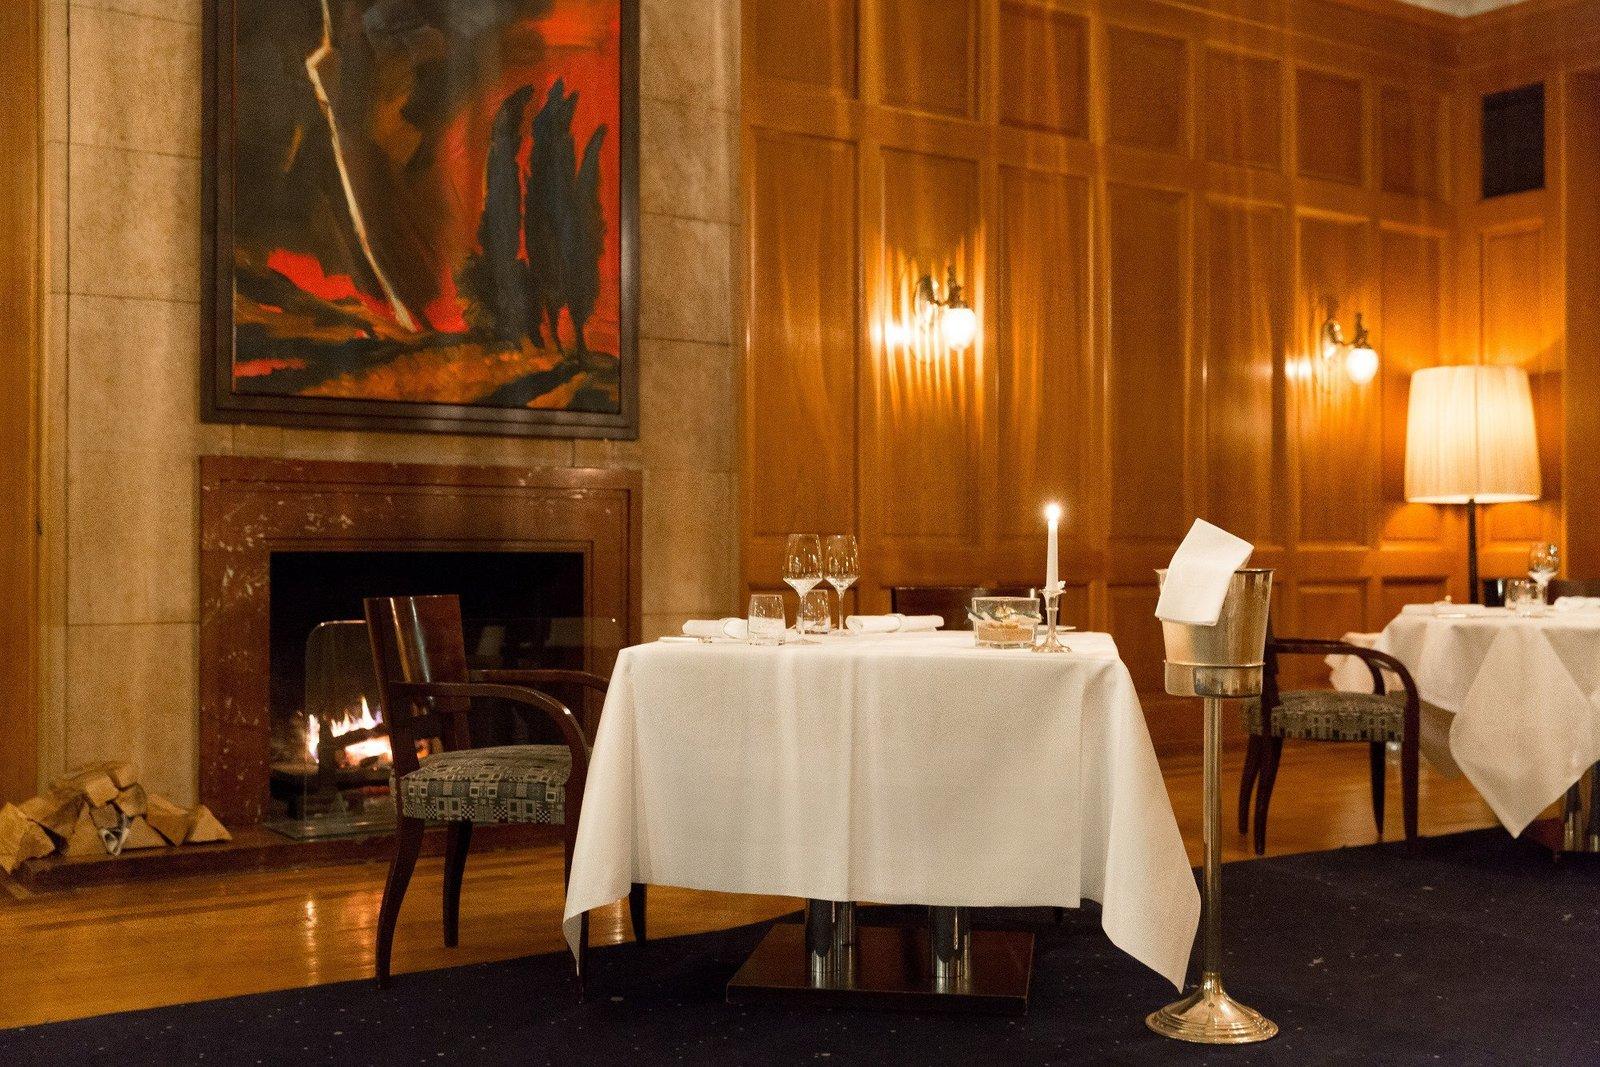 Dining Room, Standard Layout Fireplace, Wall Lighting, Floor Lighting, Rug Floor, Chair, Table, and Medium Hardwood Floor  Hotel Elephant